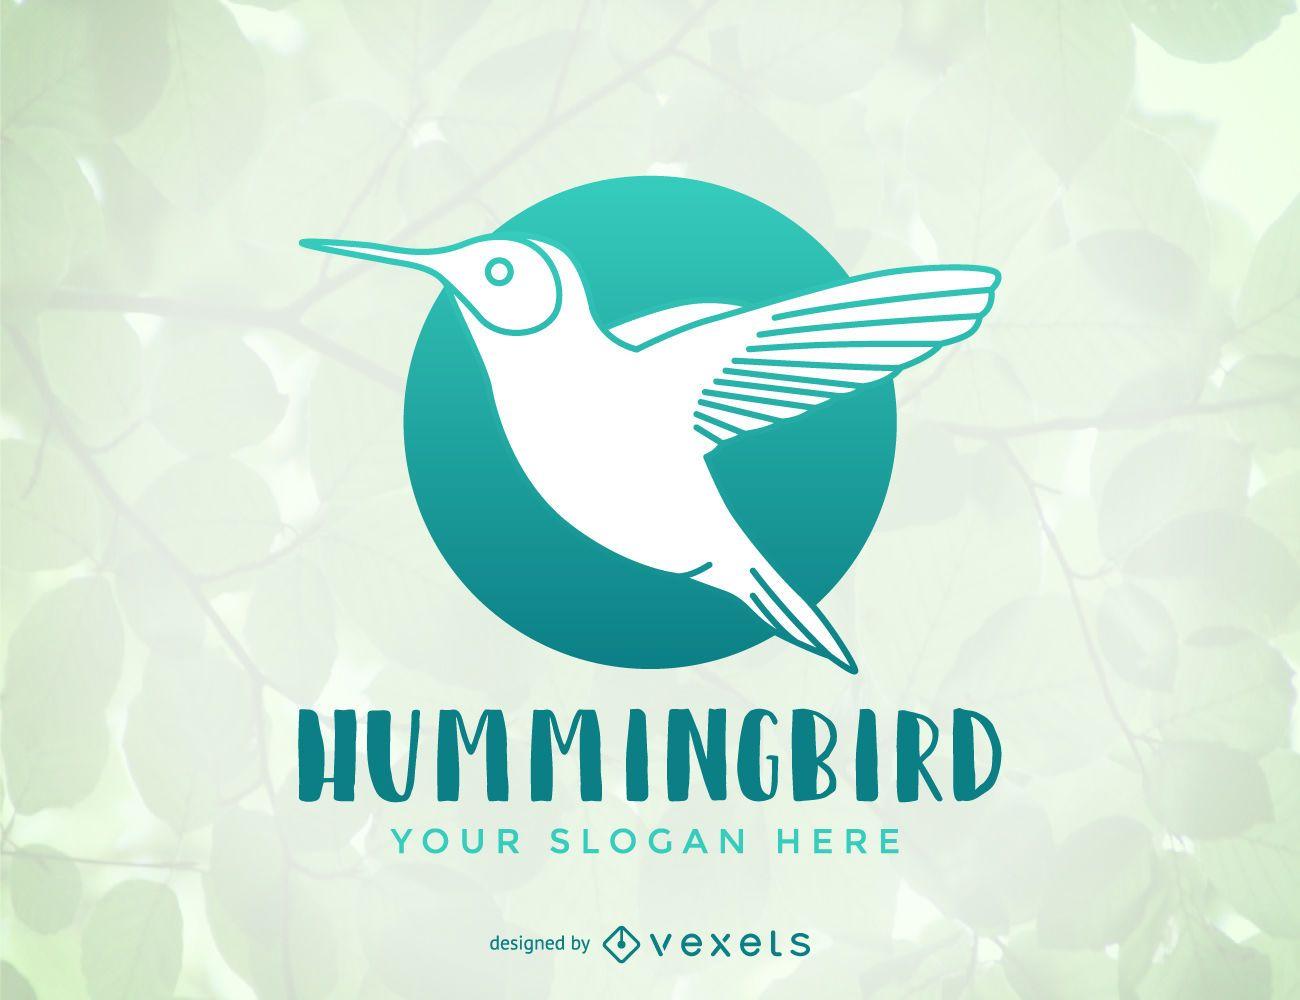 Hummingbird logo template design